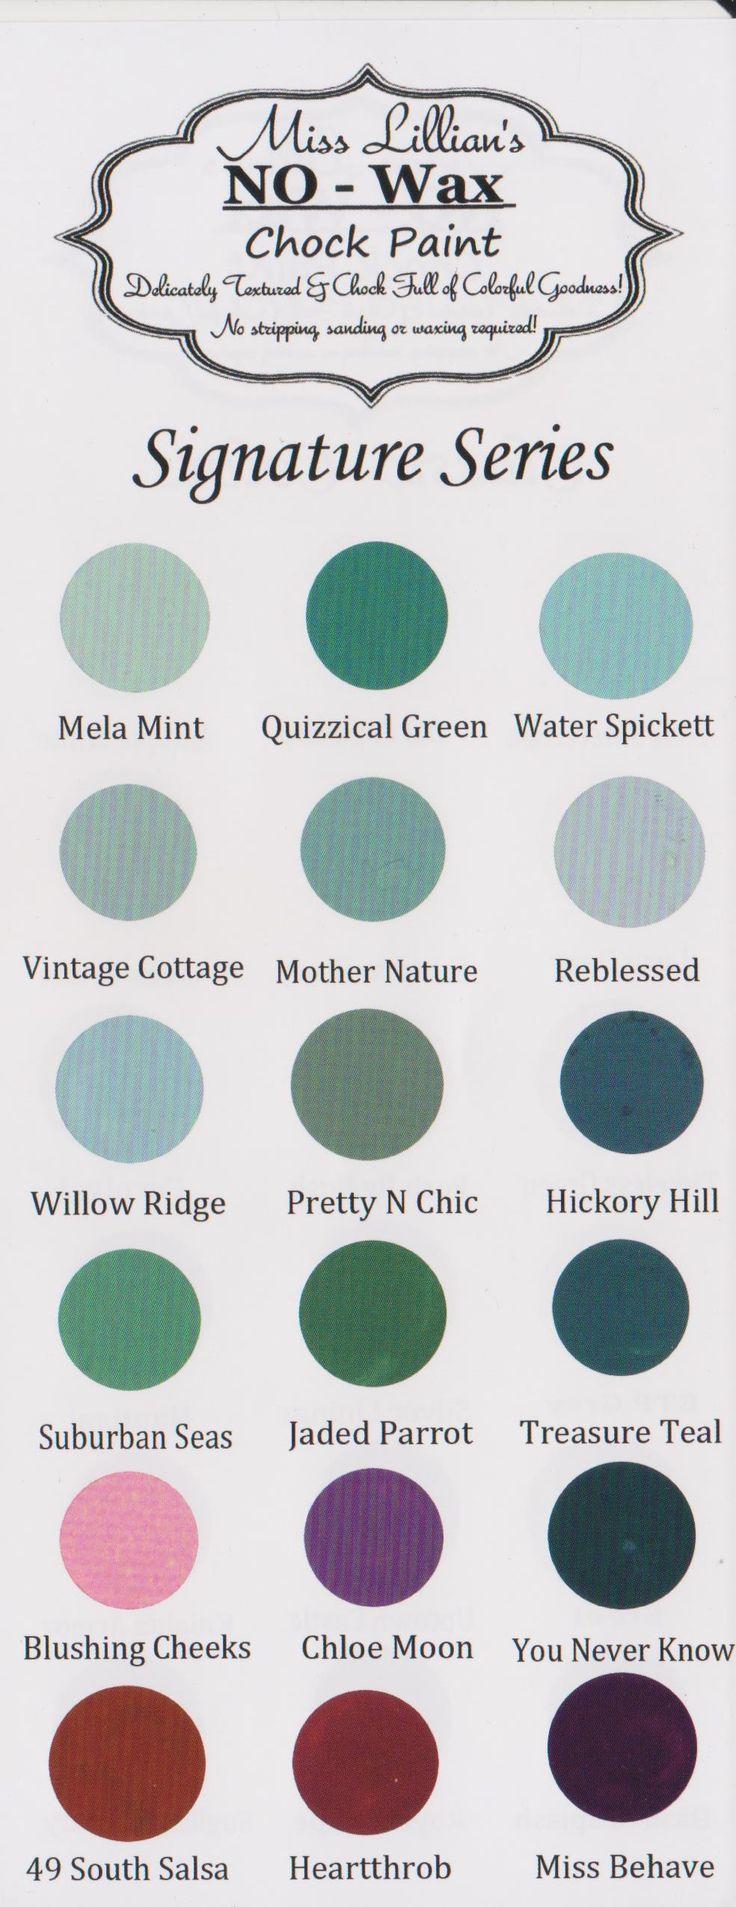 96 best miss lillians no wax chock paint images on pinterest miss lillians color chart nvjuhfo Choice Image